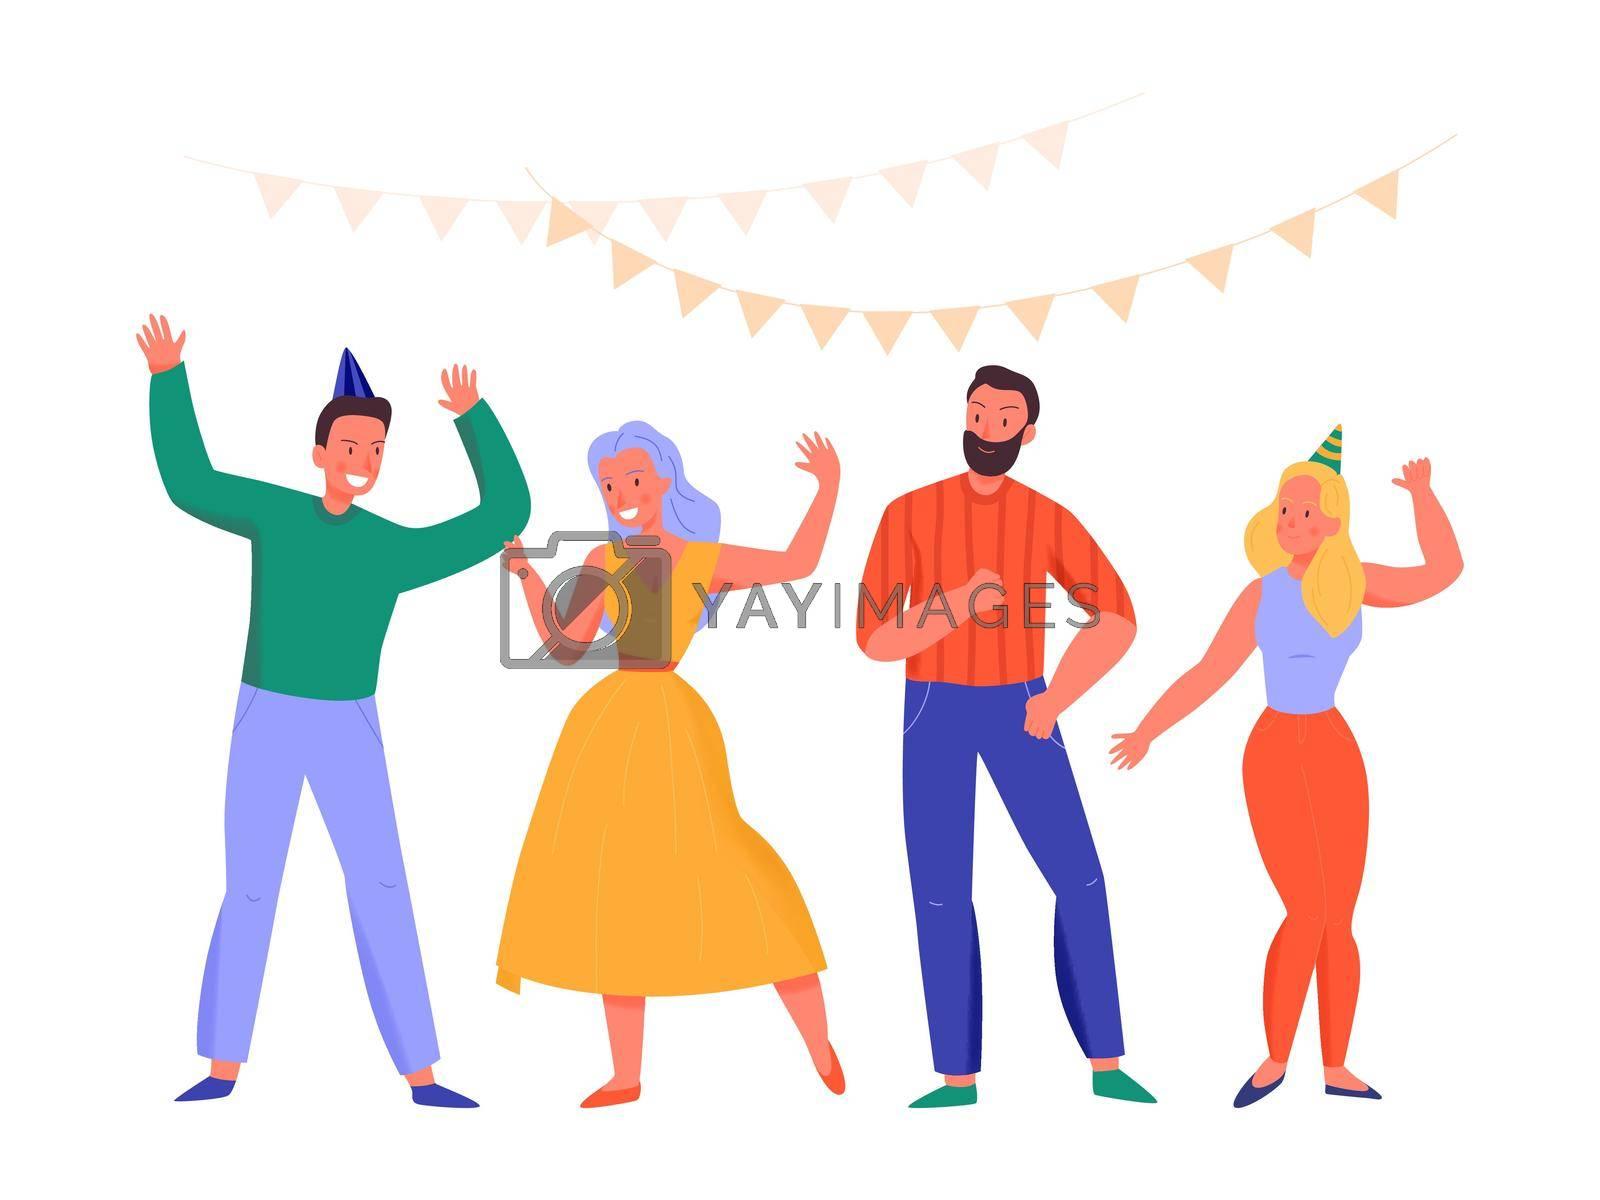 Royalty free image of Flat Dancing People by mstjahanara